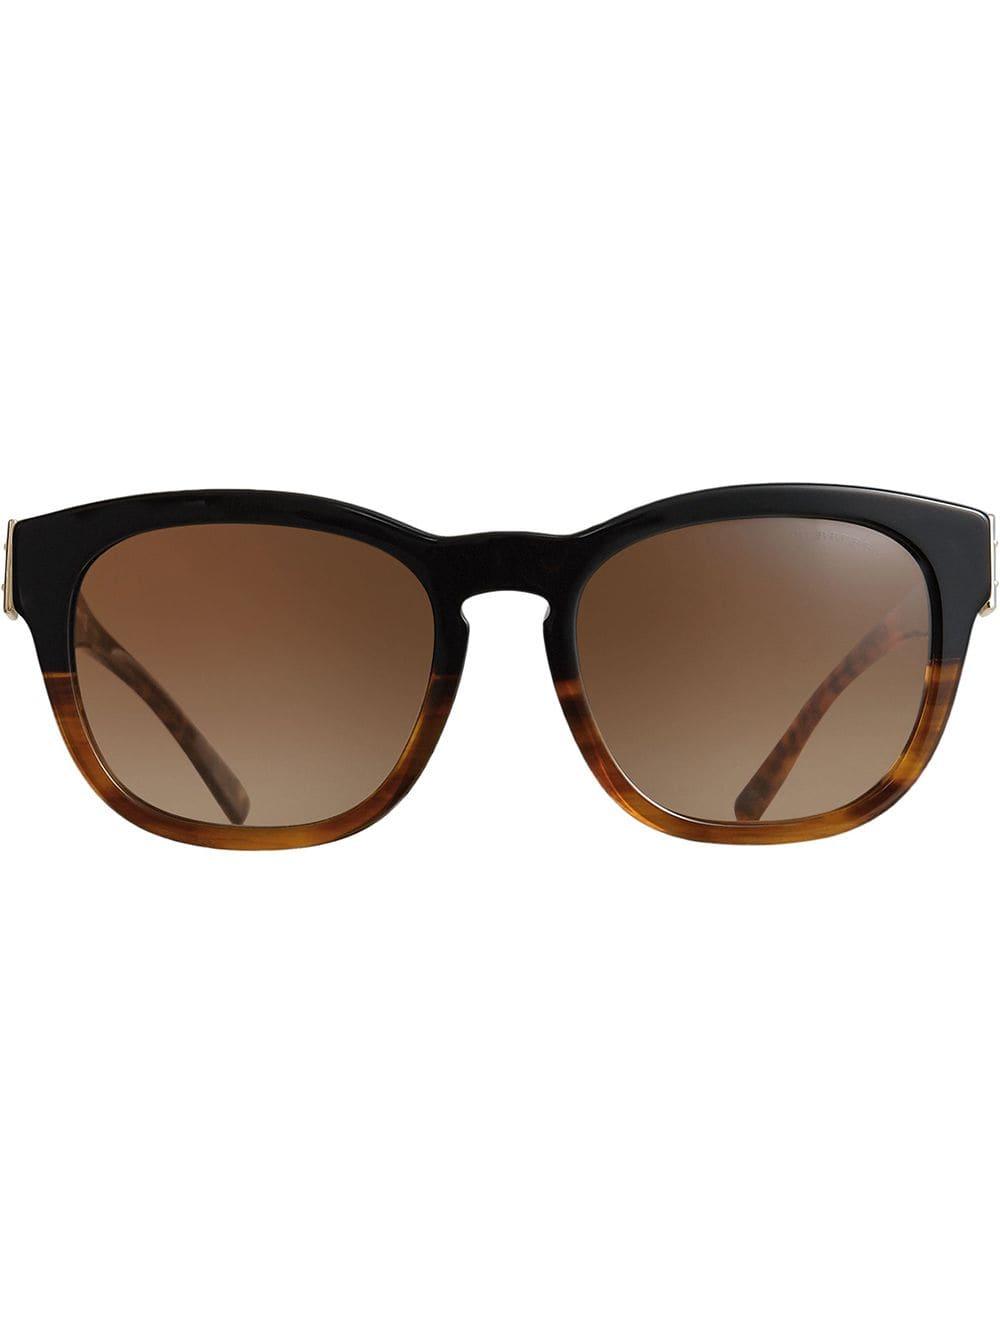 Burberry Eyewear Buckle Detail Square Frame Sunglasses - Black ... a8486e2a8b2